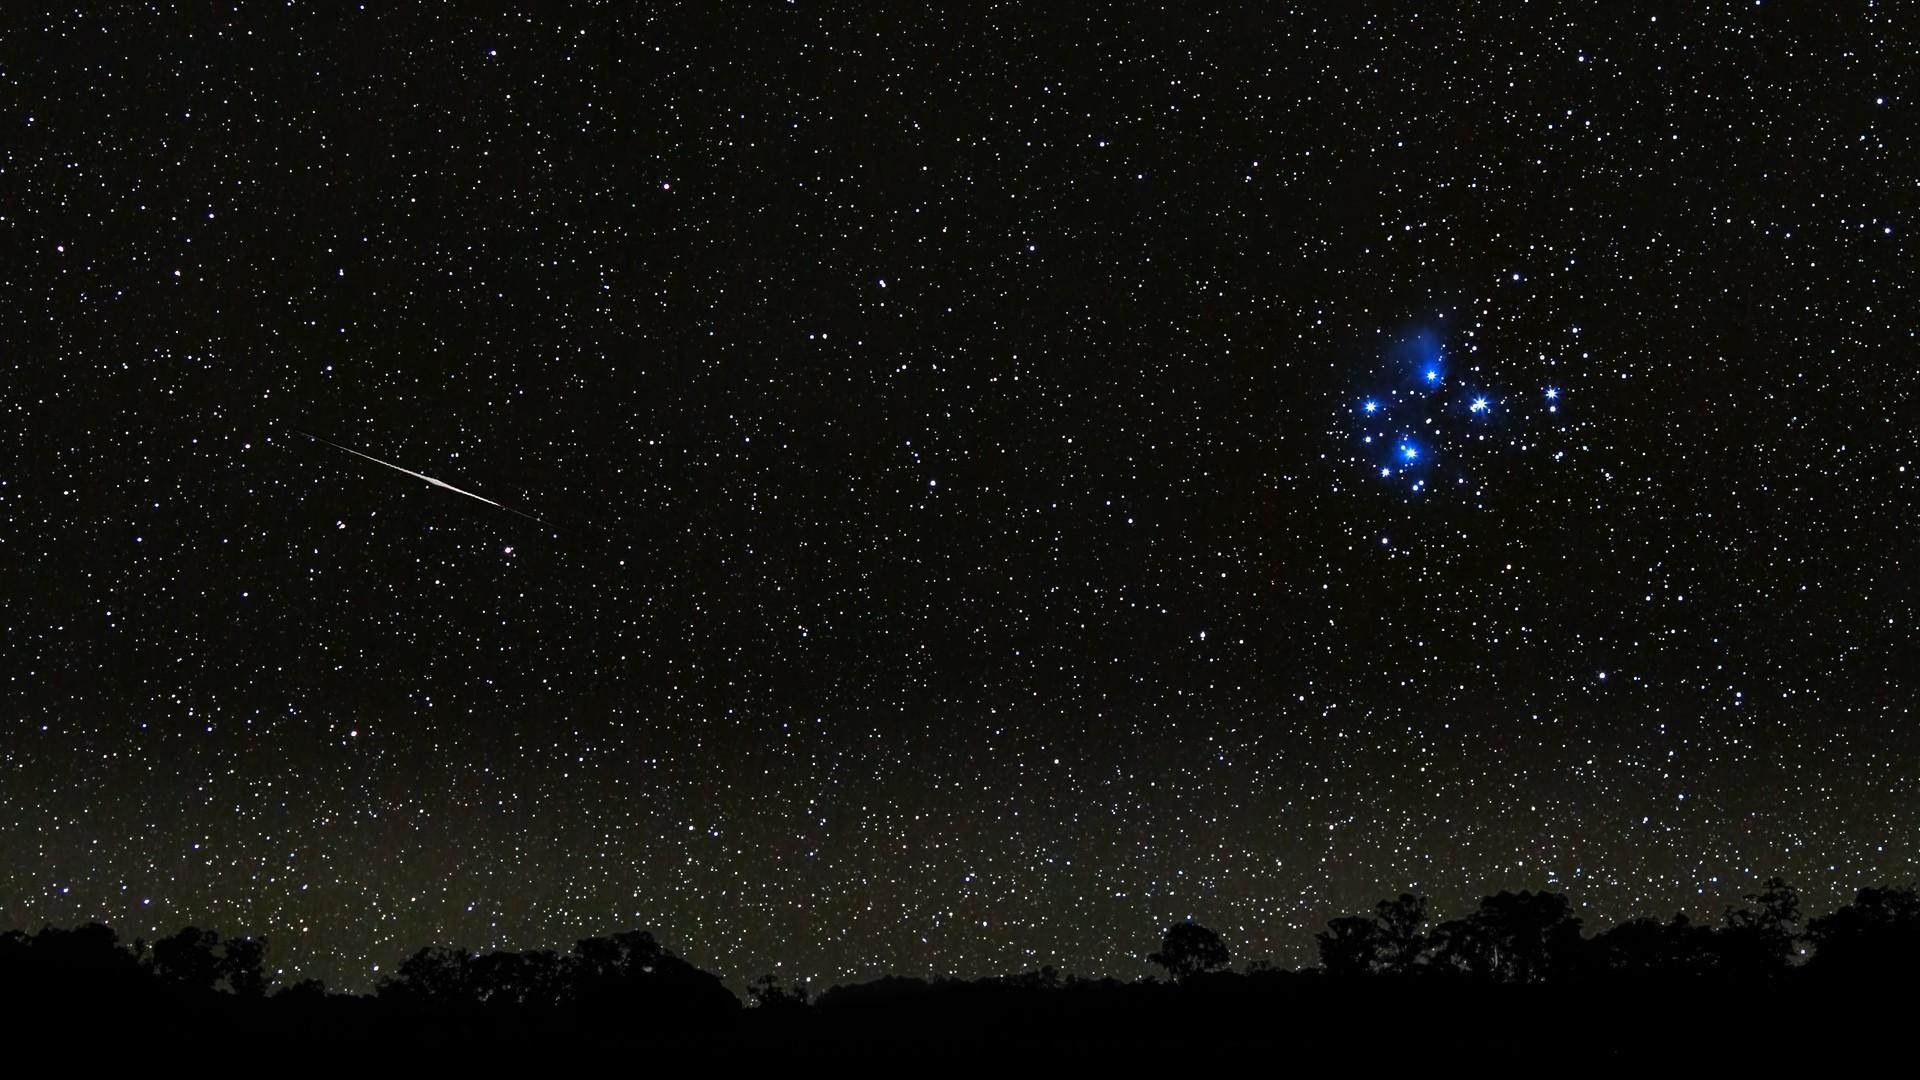 Space stars night